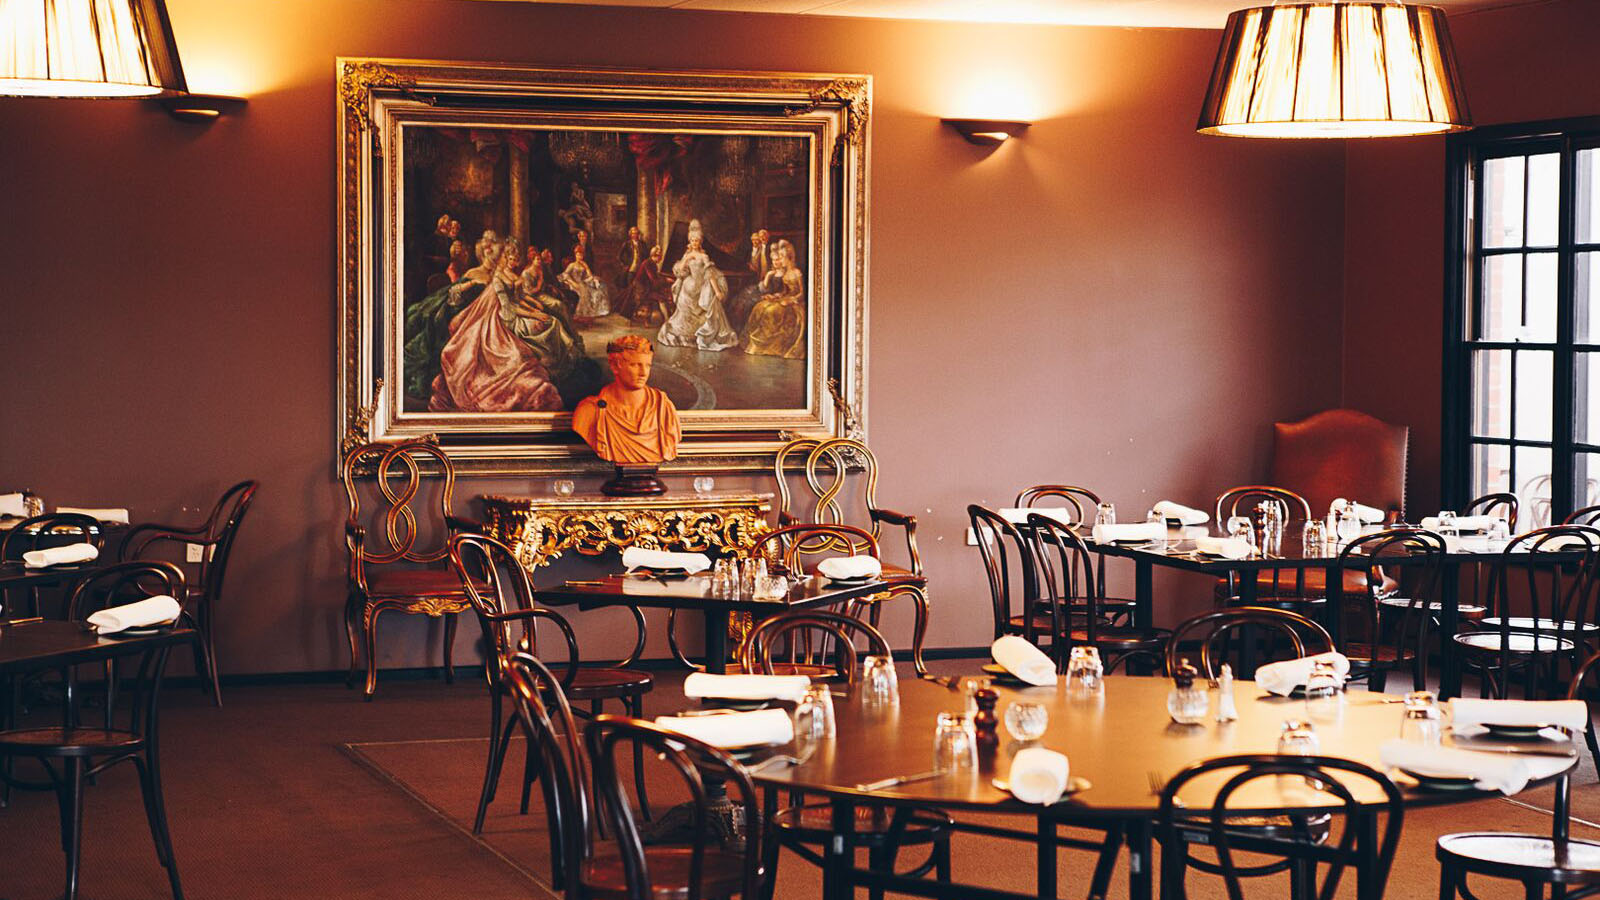 Tinamba Hotel  Food And Wine  Gippsland  Victoria  Australia